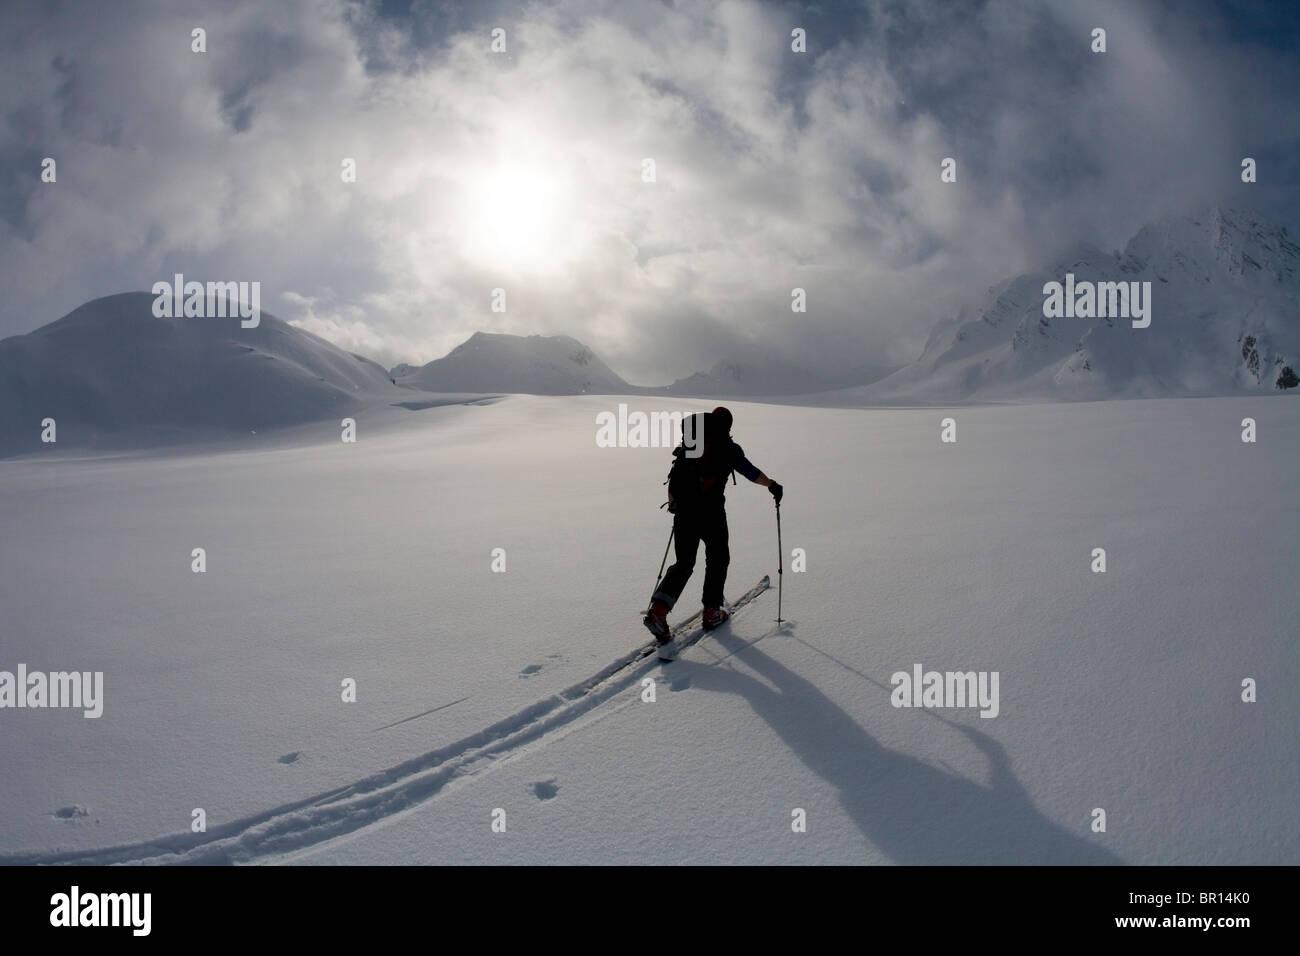 Backcountry skier crosses glacier under late day stormy sky. Stock Photo